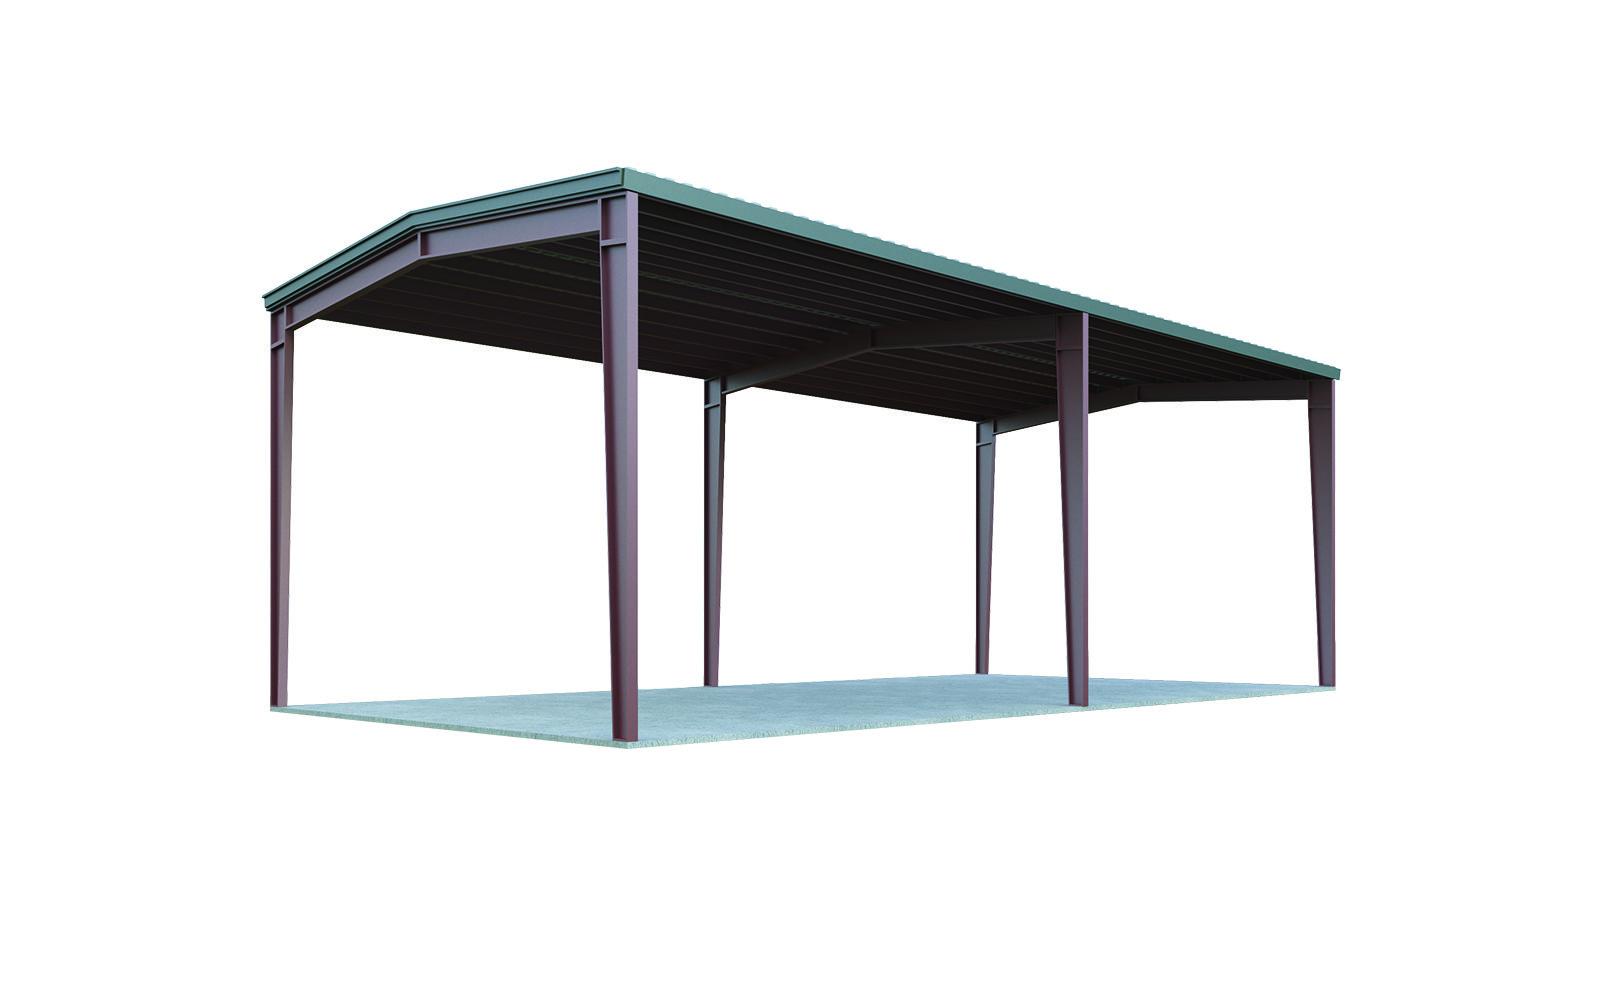 20x40 Carport Quick Prices General steel buildings